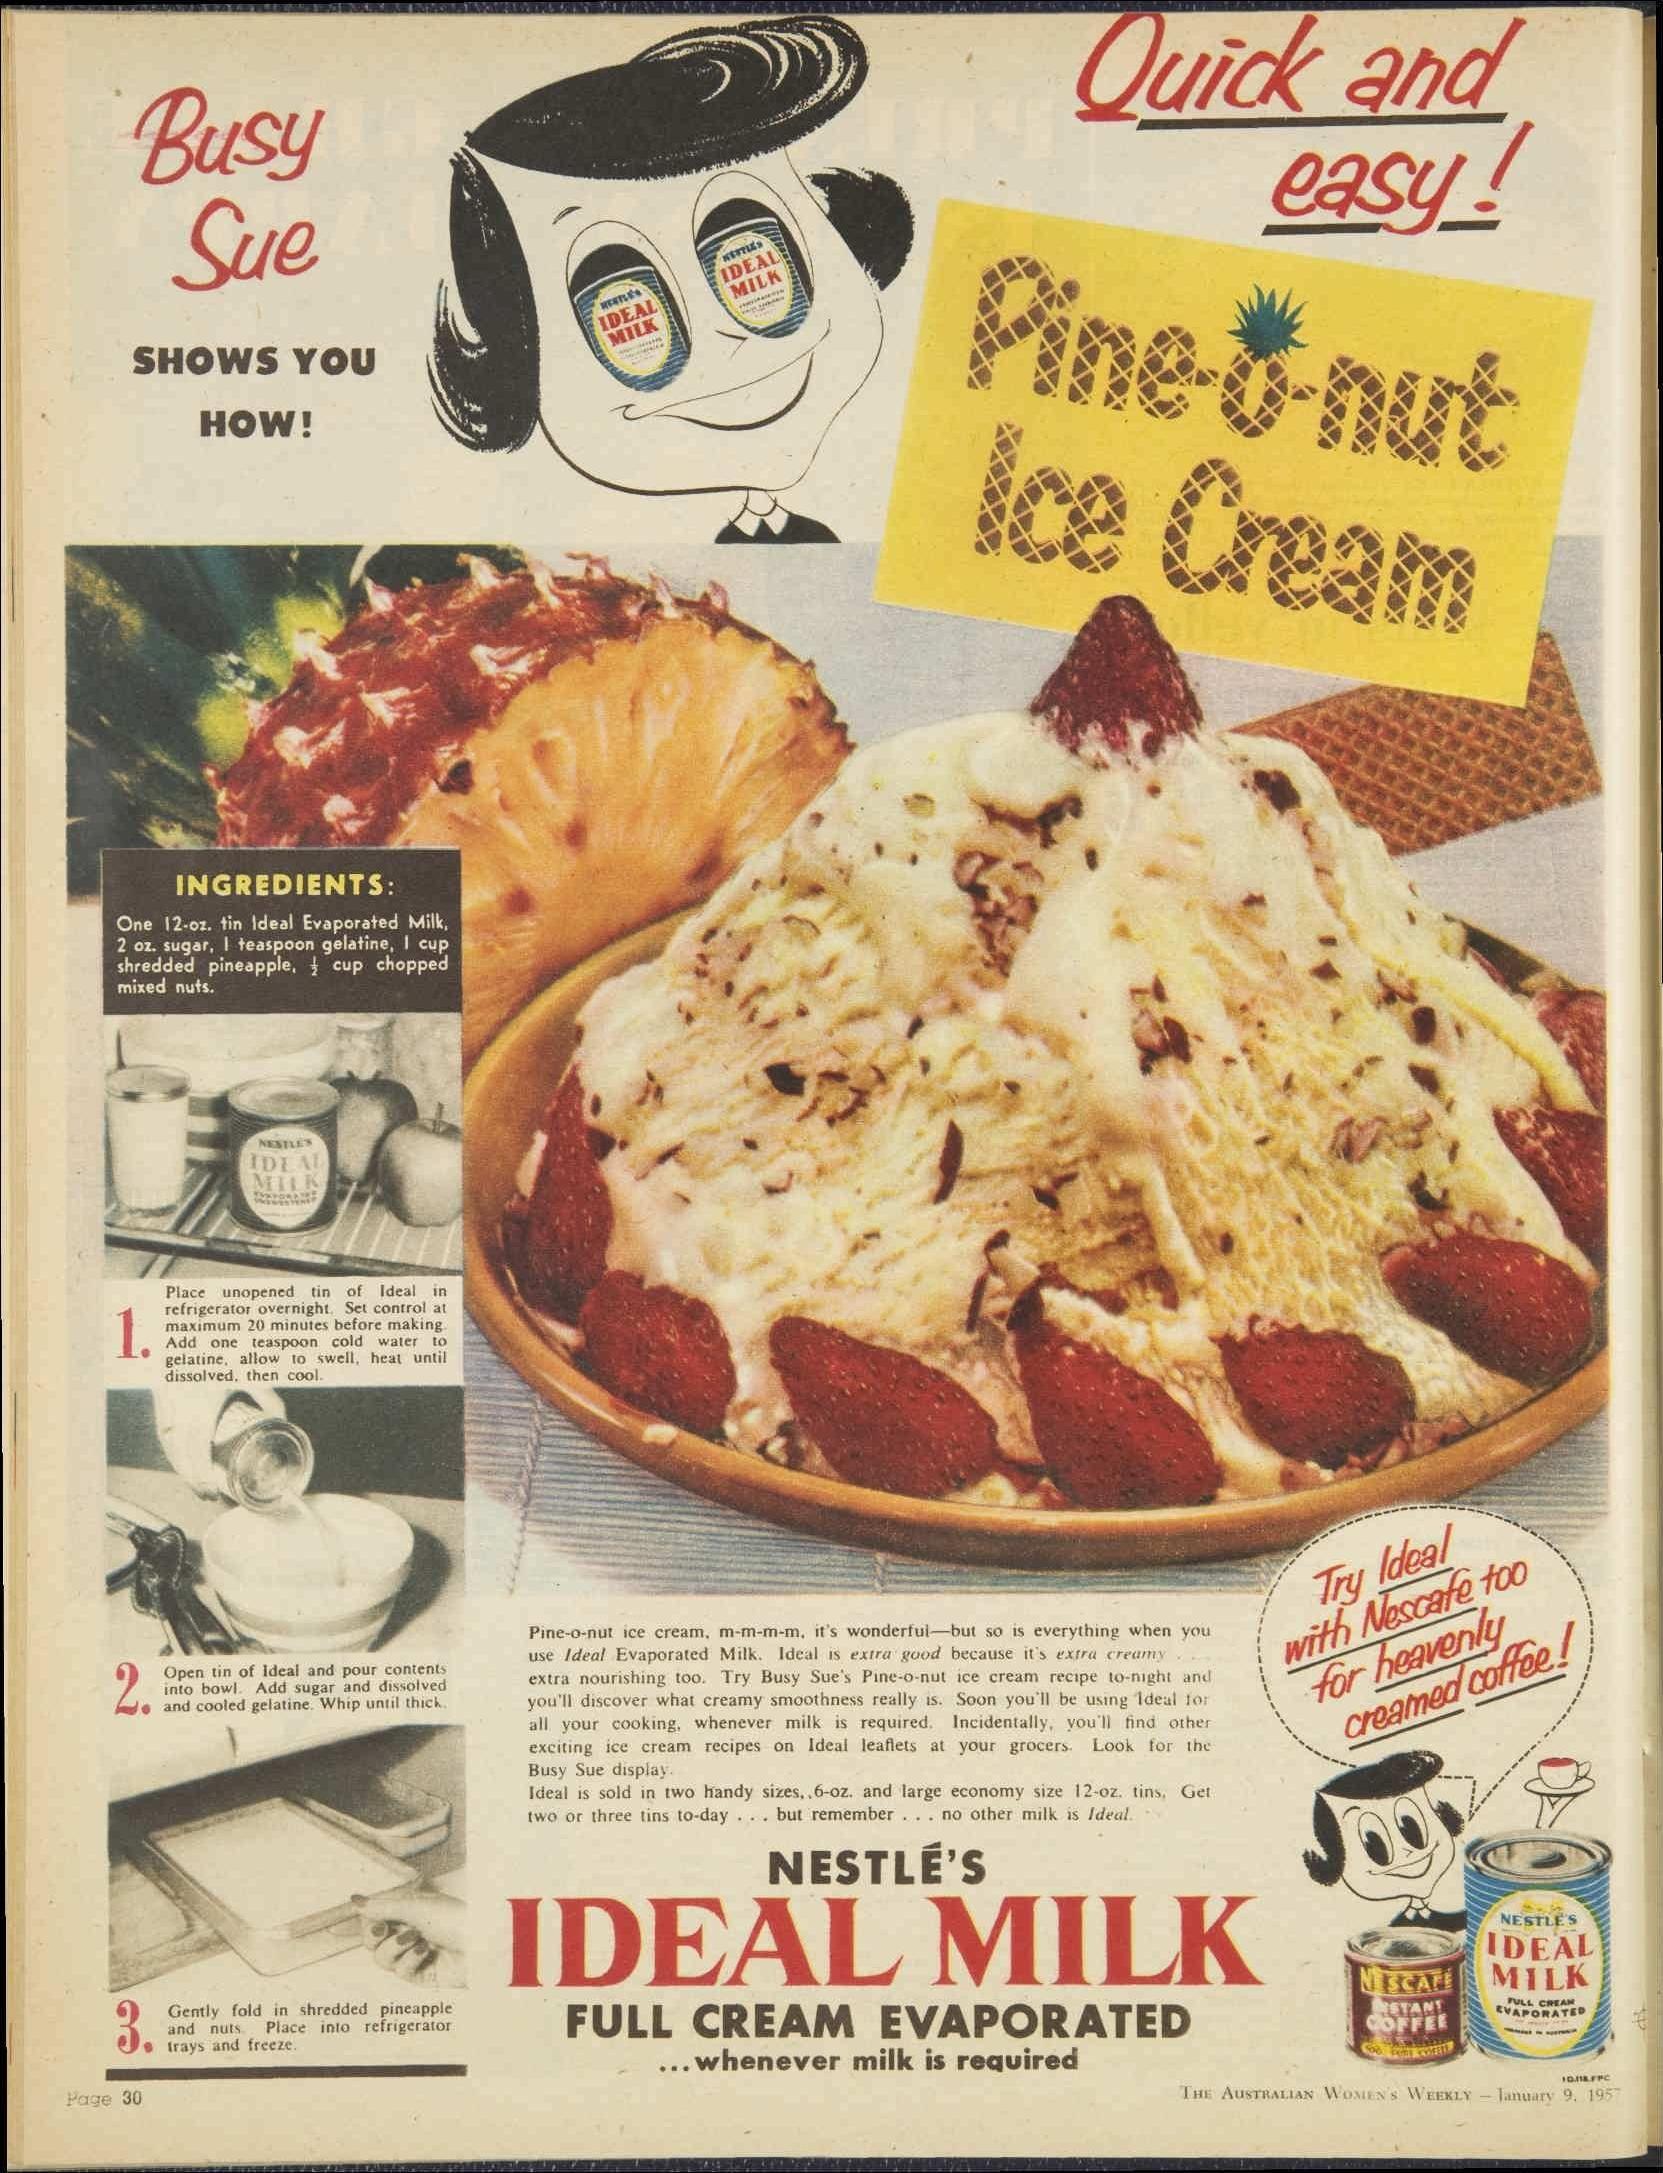 Vintage 50s Nestle Ideal Milk Advertisement  Pineonut Ice Cream Recipe  1957